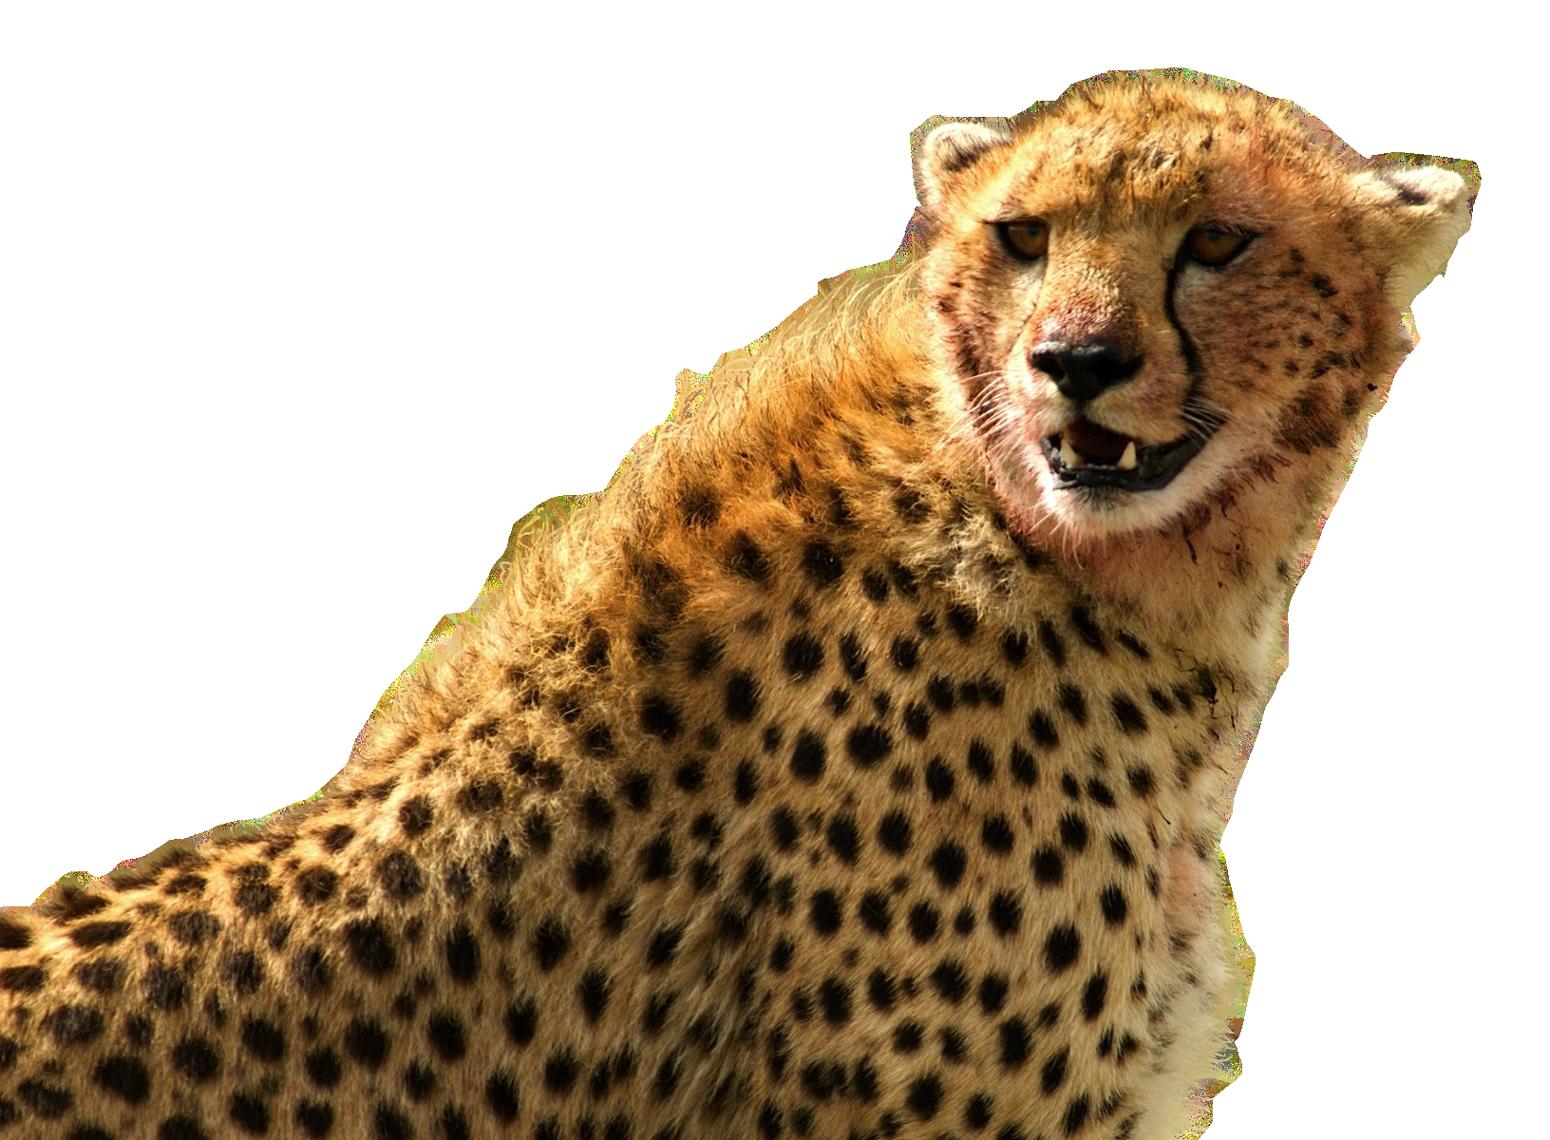 Cheetah PNG Image